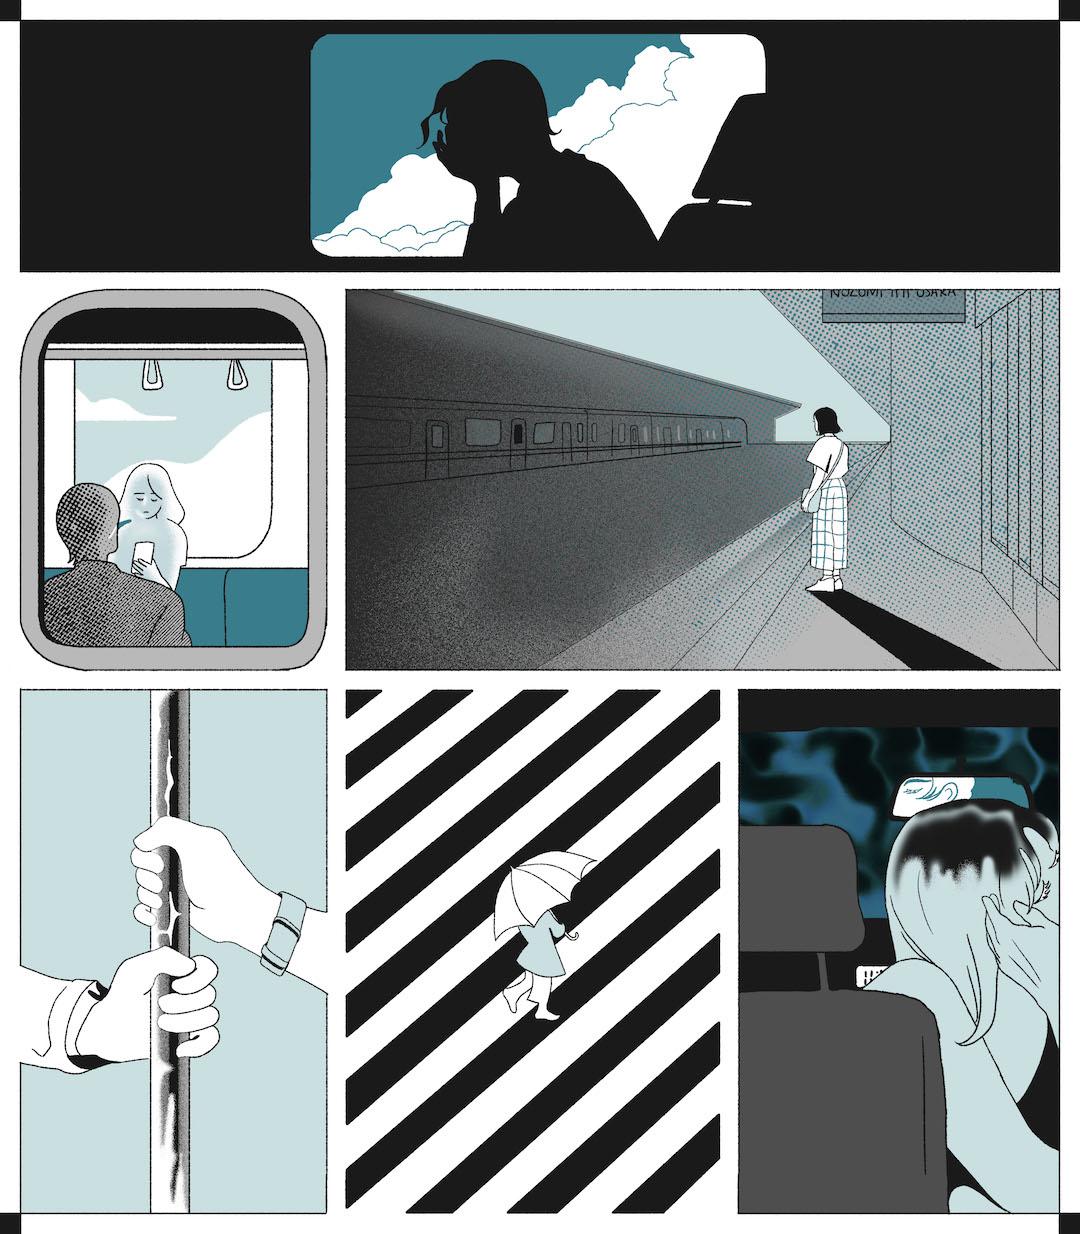 GirlsclubAsia-Artist-Gica Tam-Commute